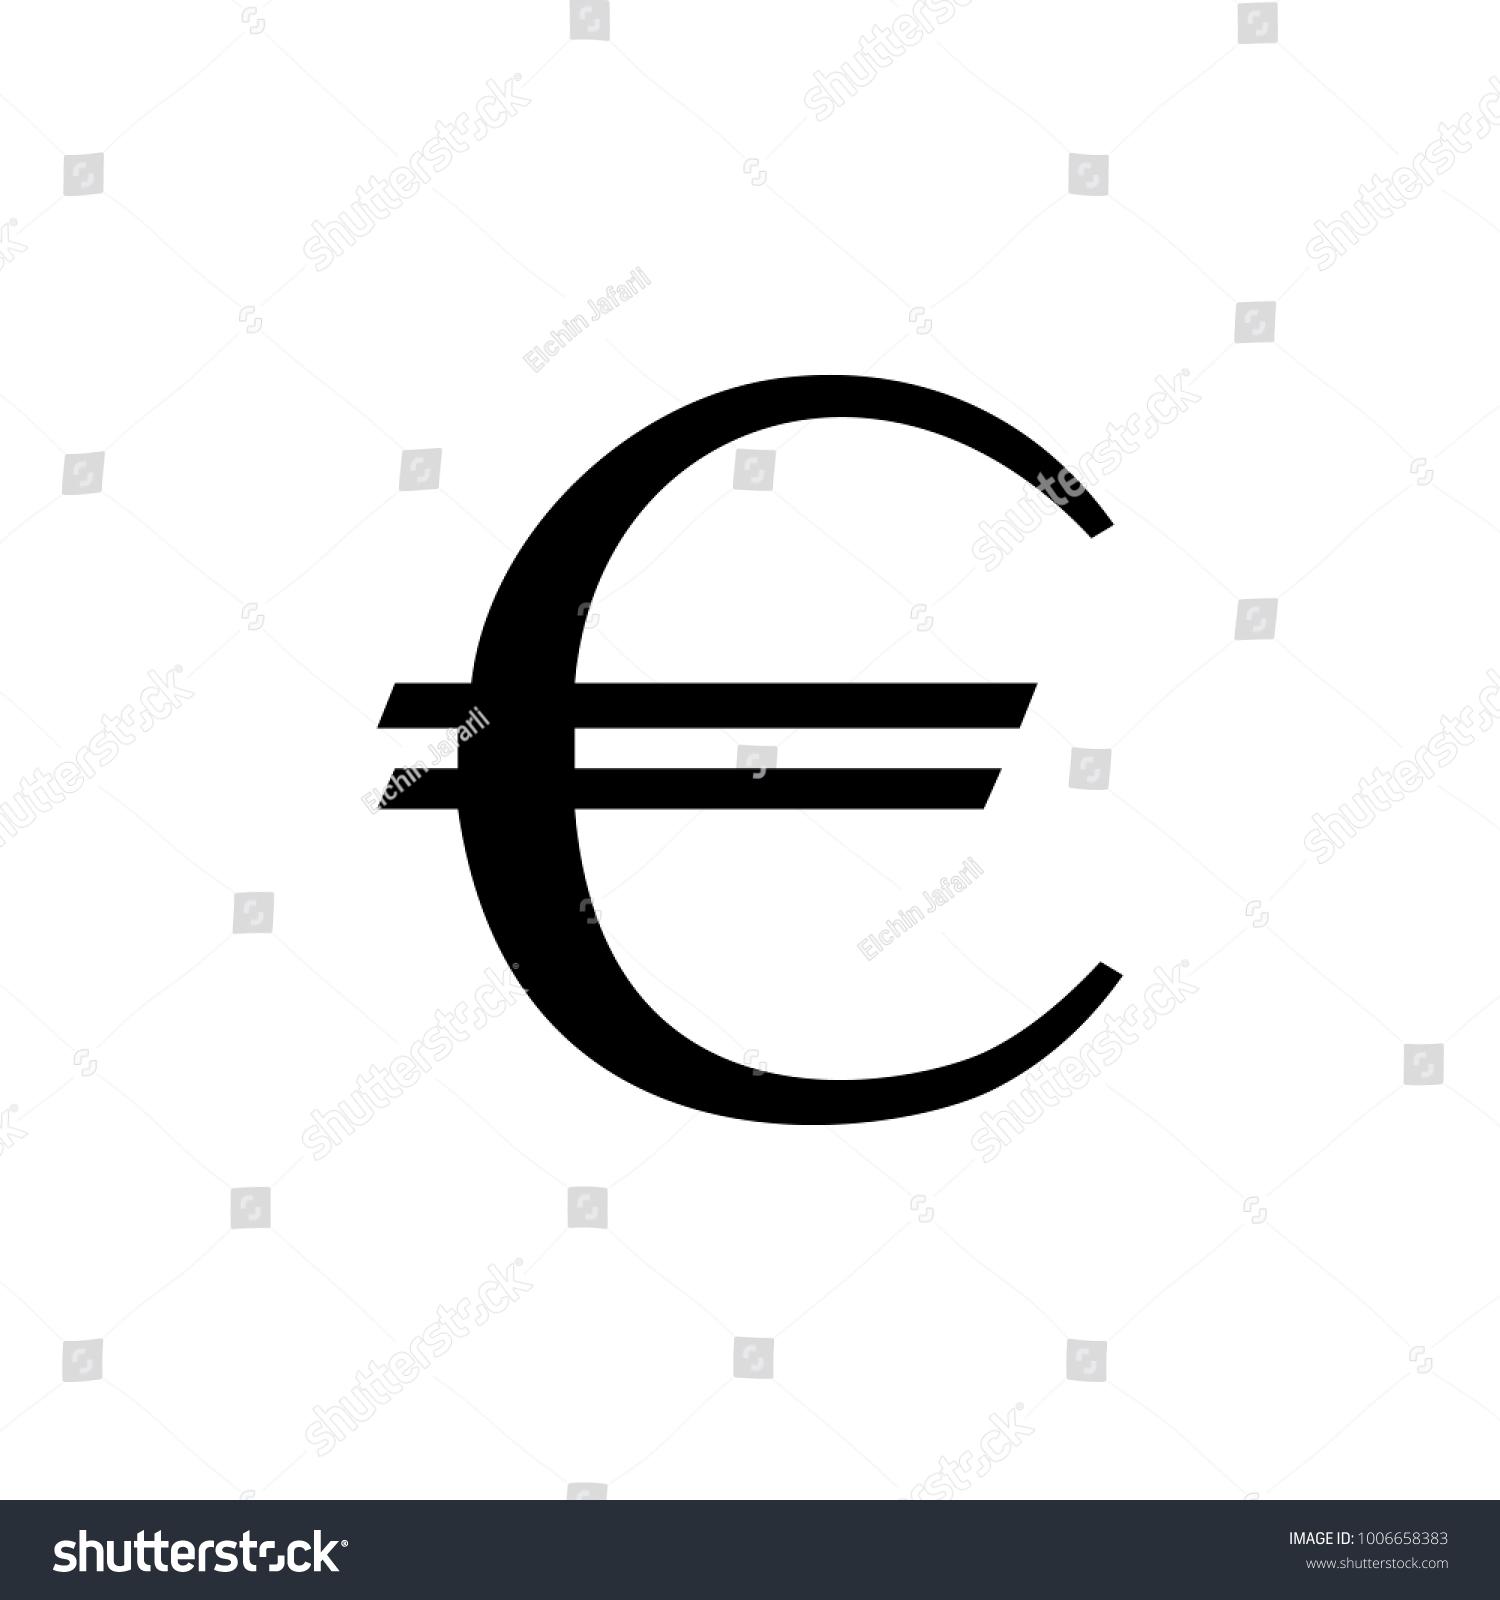 Euro sign icon element money symbol stock illustration 1006658383 euro sign icon element of money symbol icon premium quality graphic design icon buycottarizona Gallery